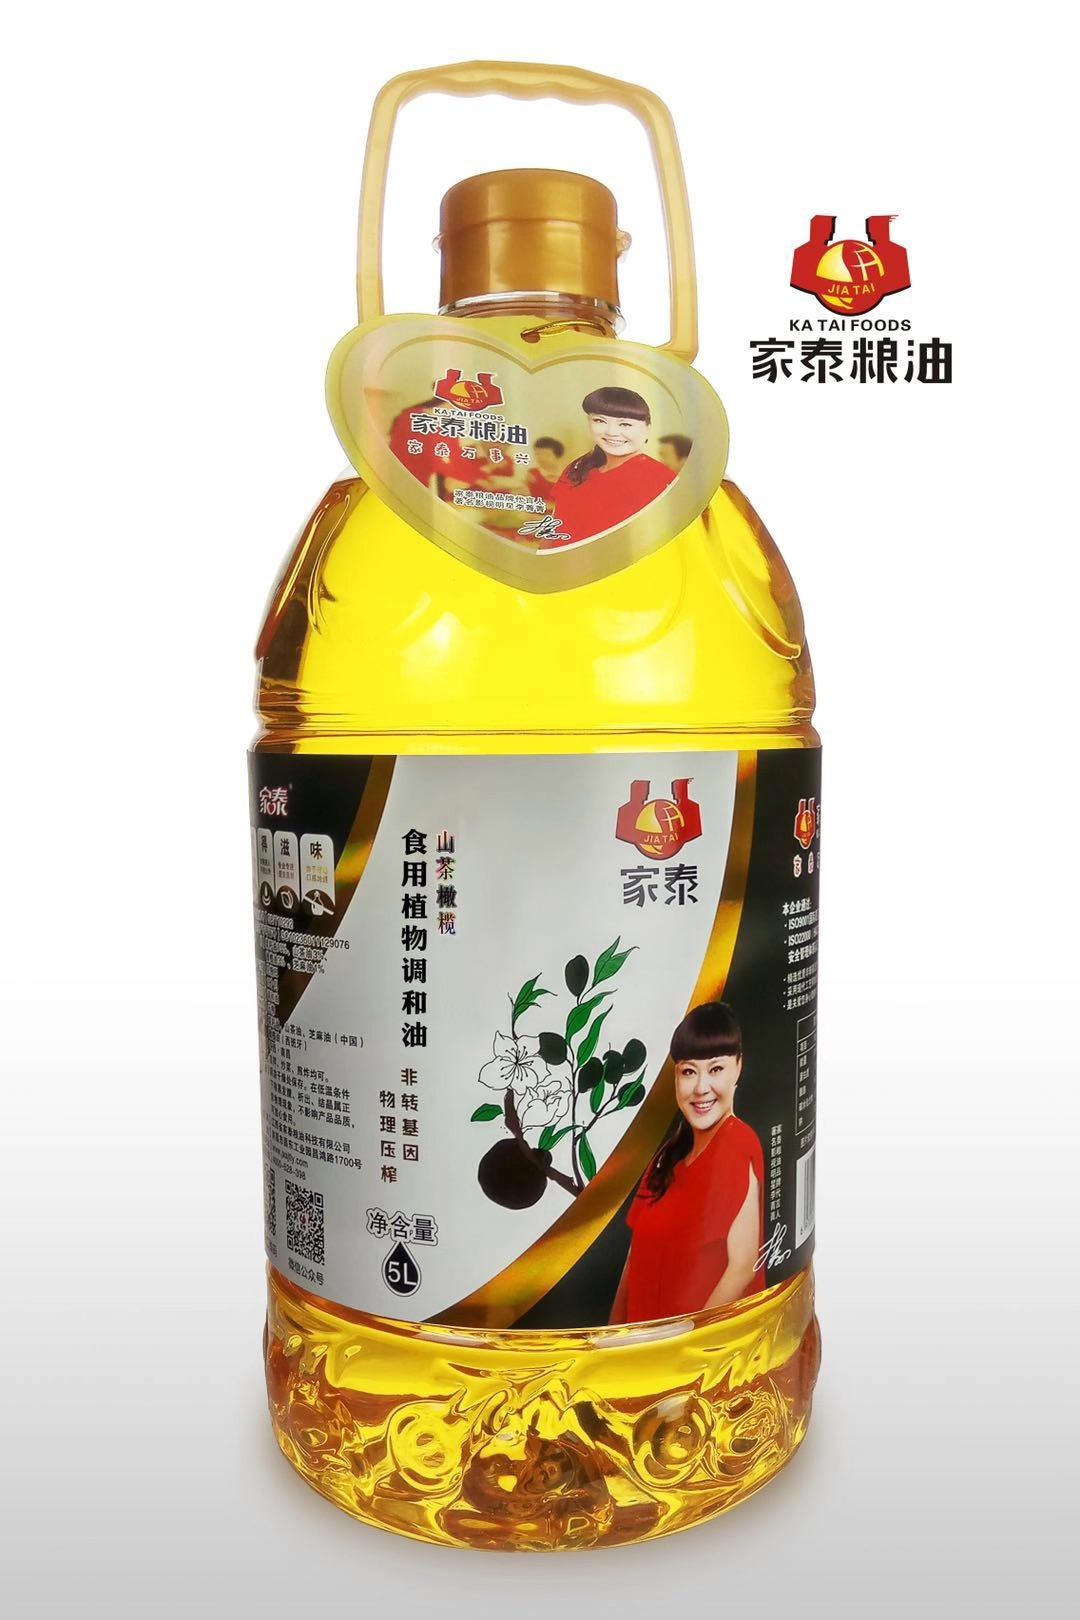 5L家泰山茶橄榄食用植物调和油--升级珍品